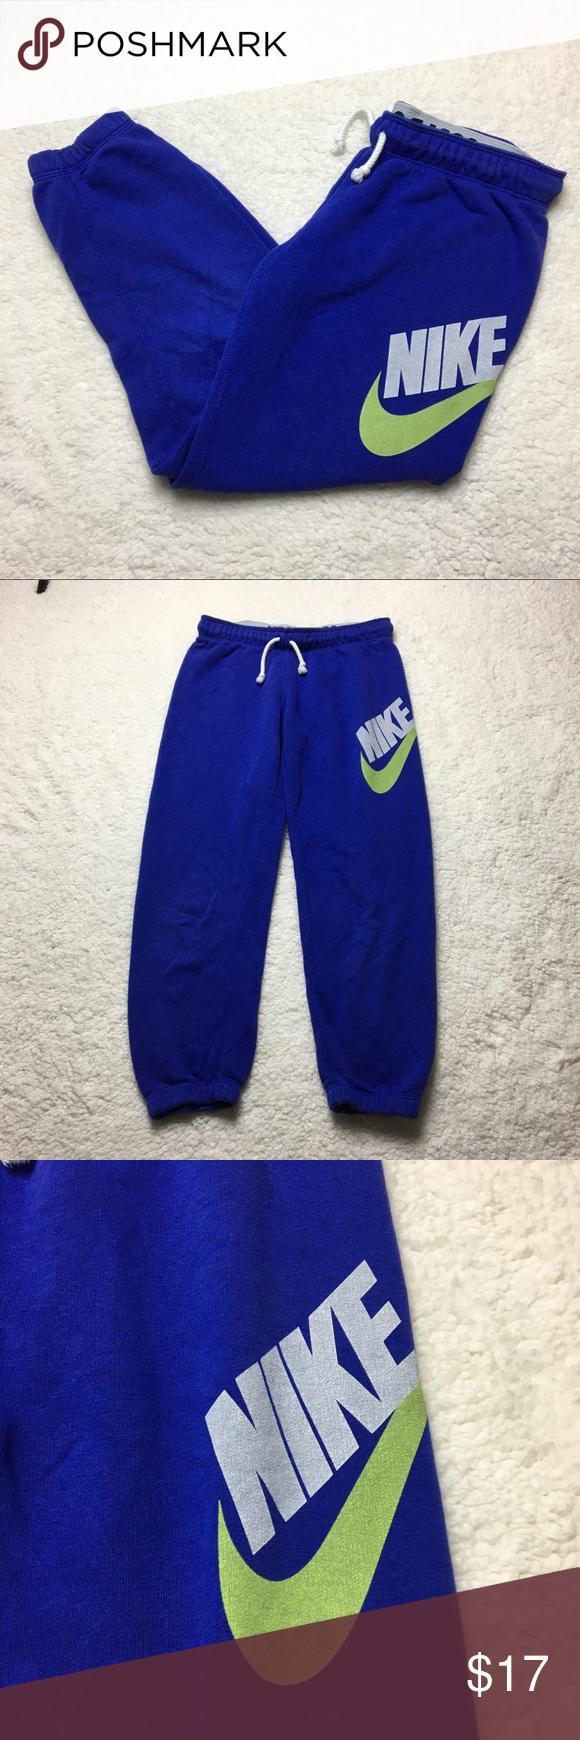 Cropped Nike logo blue sweatpants Sweatpants, Gym shorts